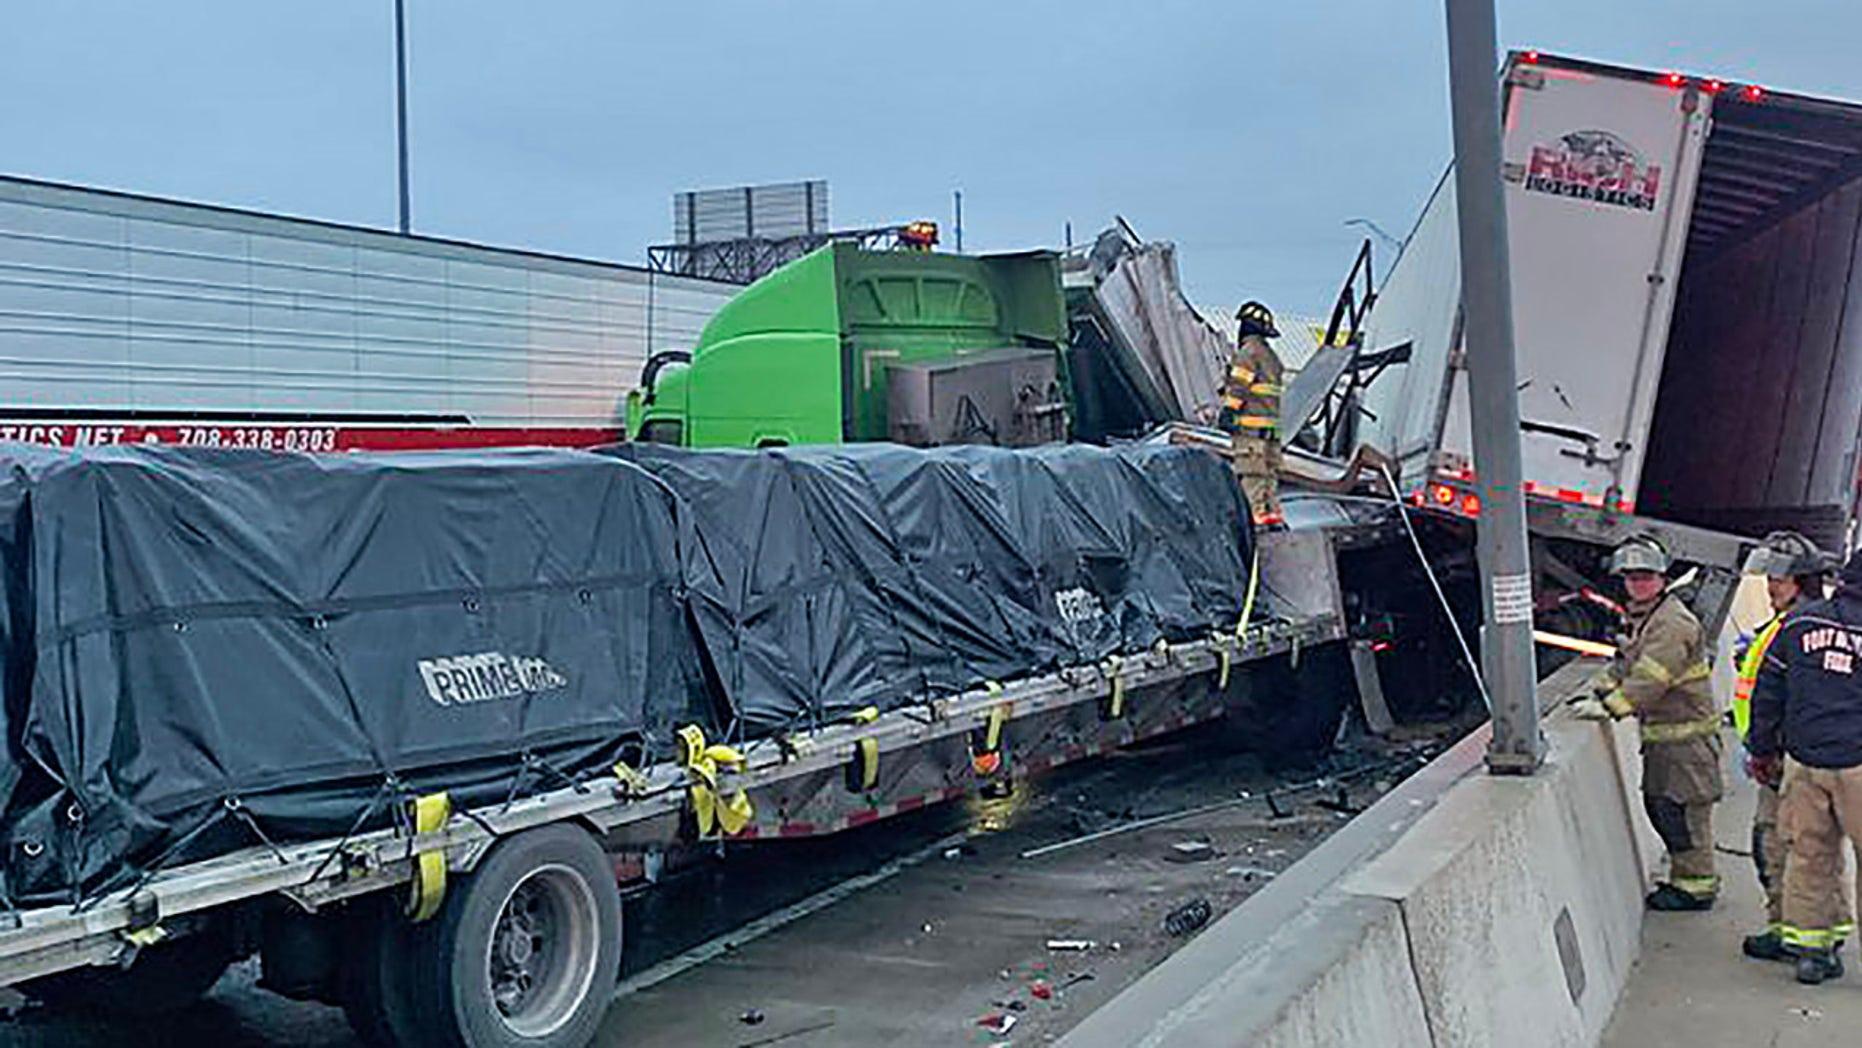 Fort Worth 100-vehicle pileup on icy Texas Interstate 35W leaves at least 5 dead, multiple people injured